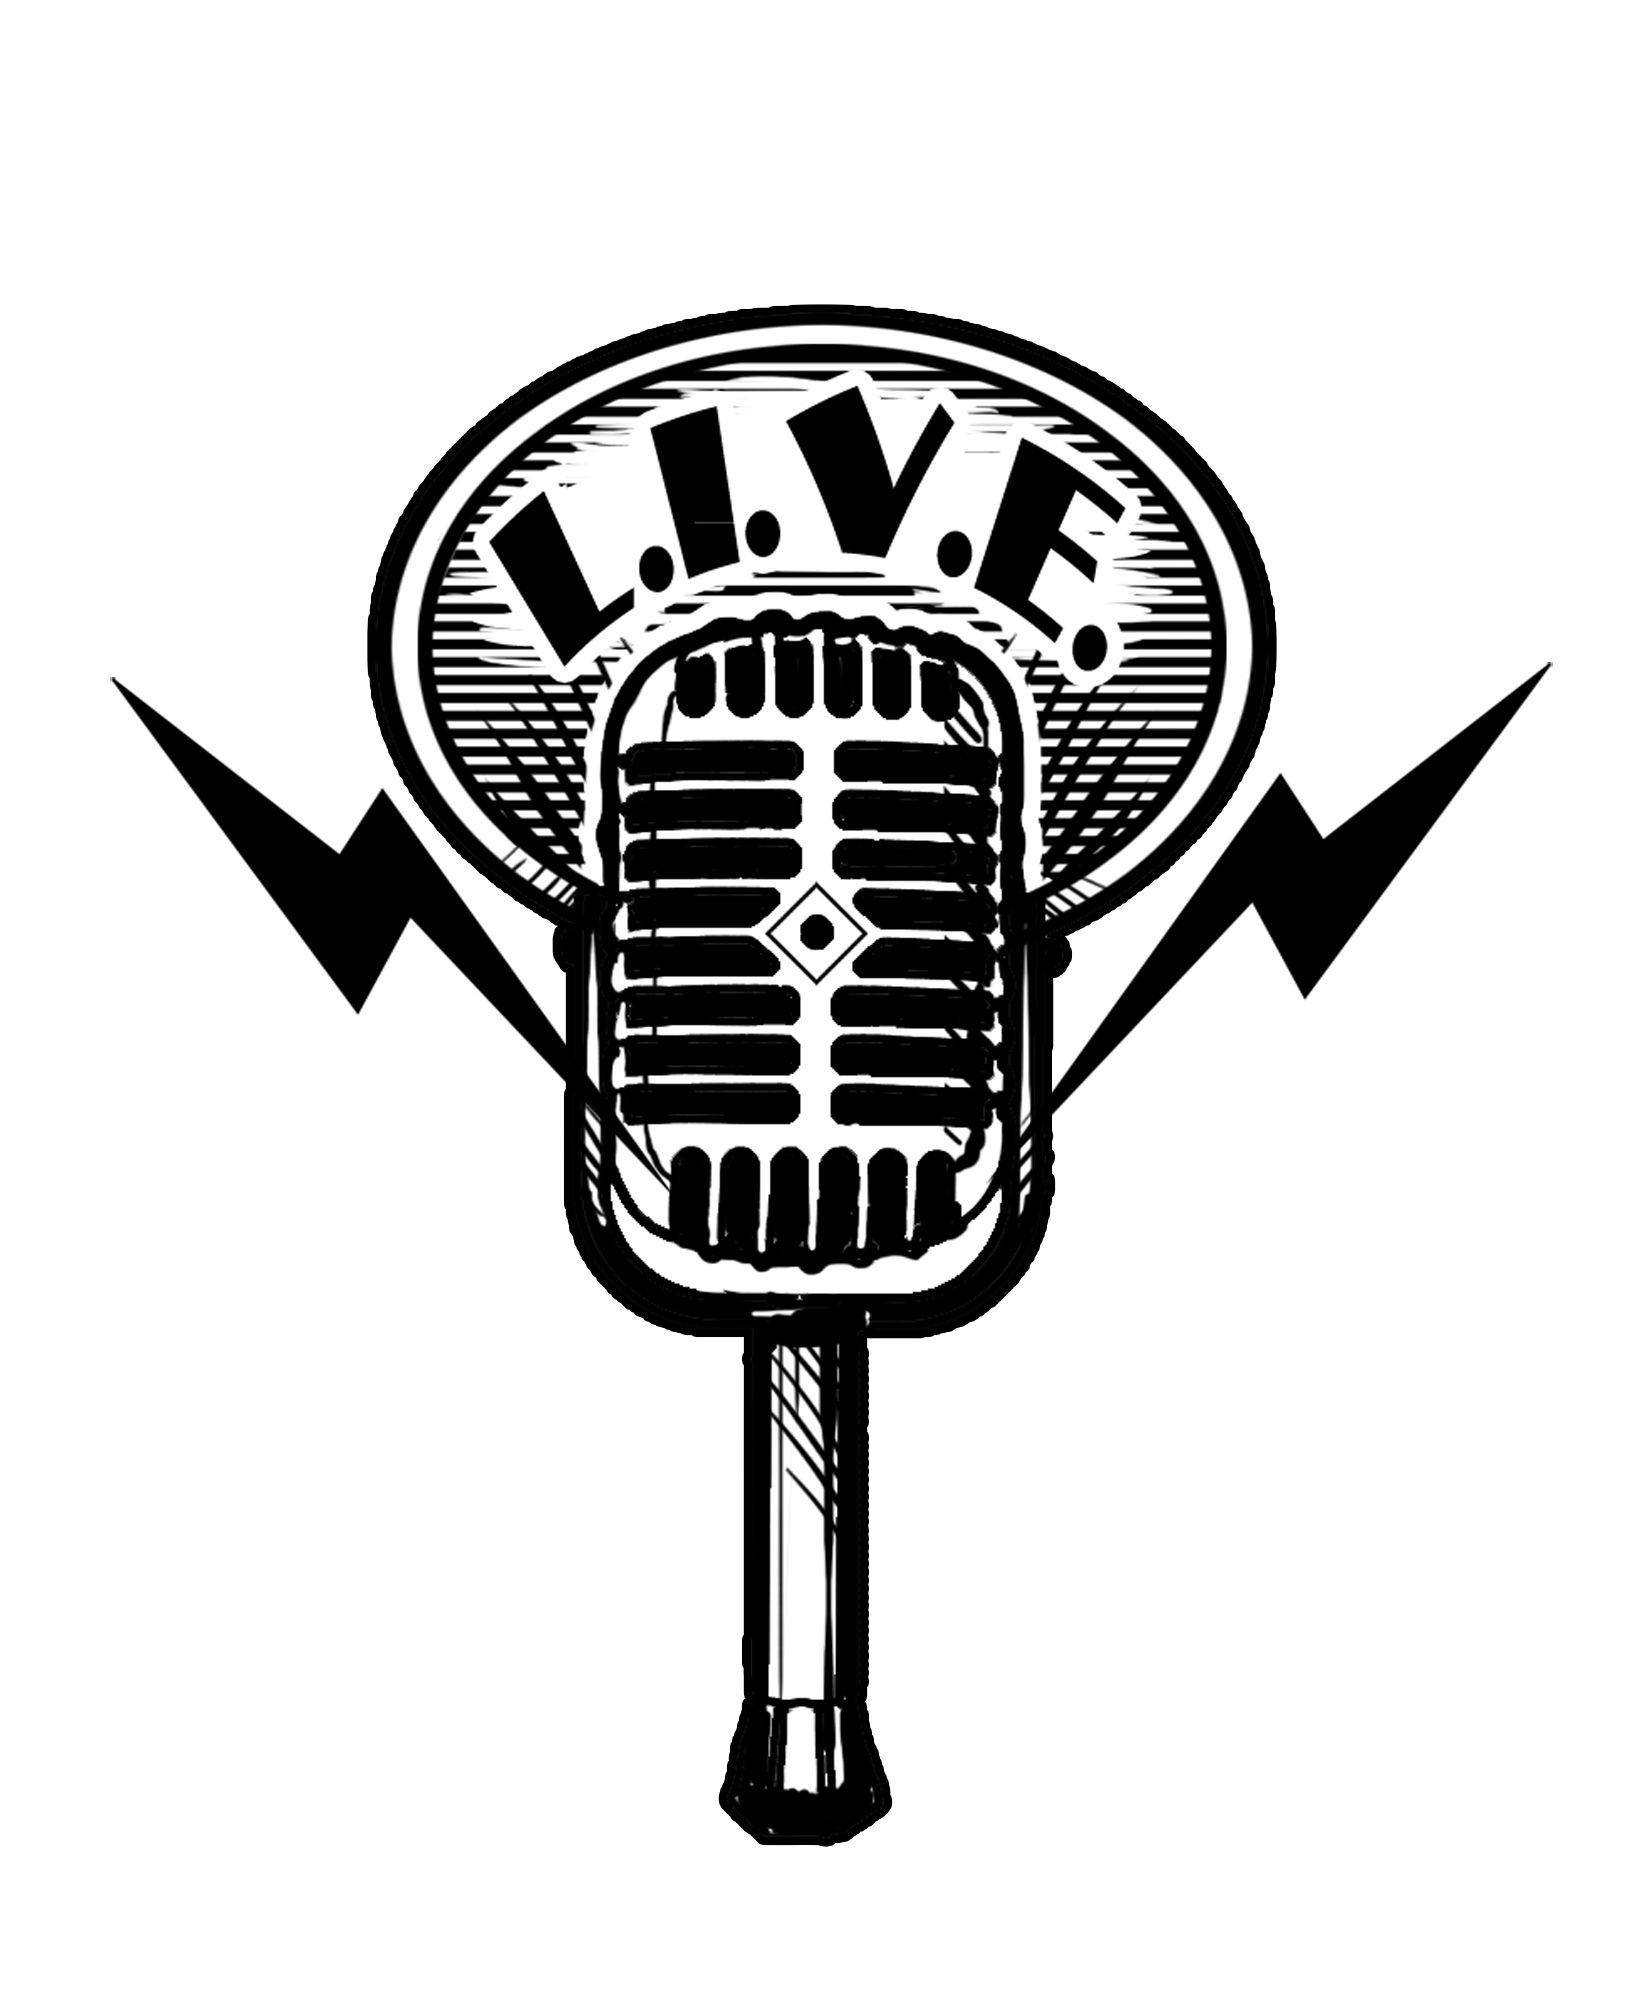 Show logo png microphone. Air clipart radio mic